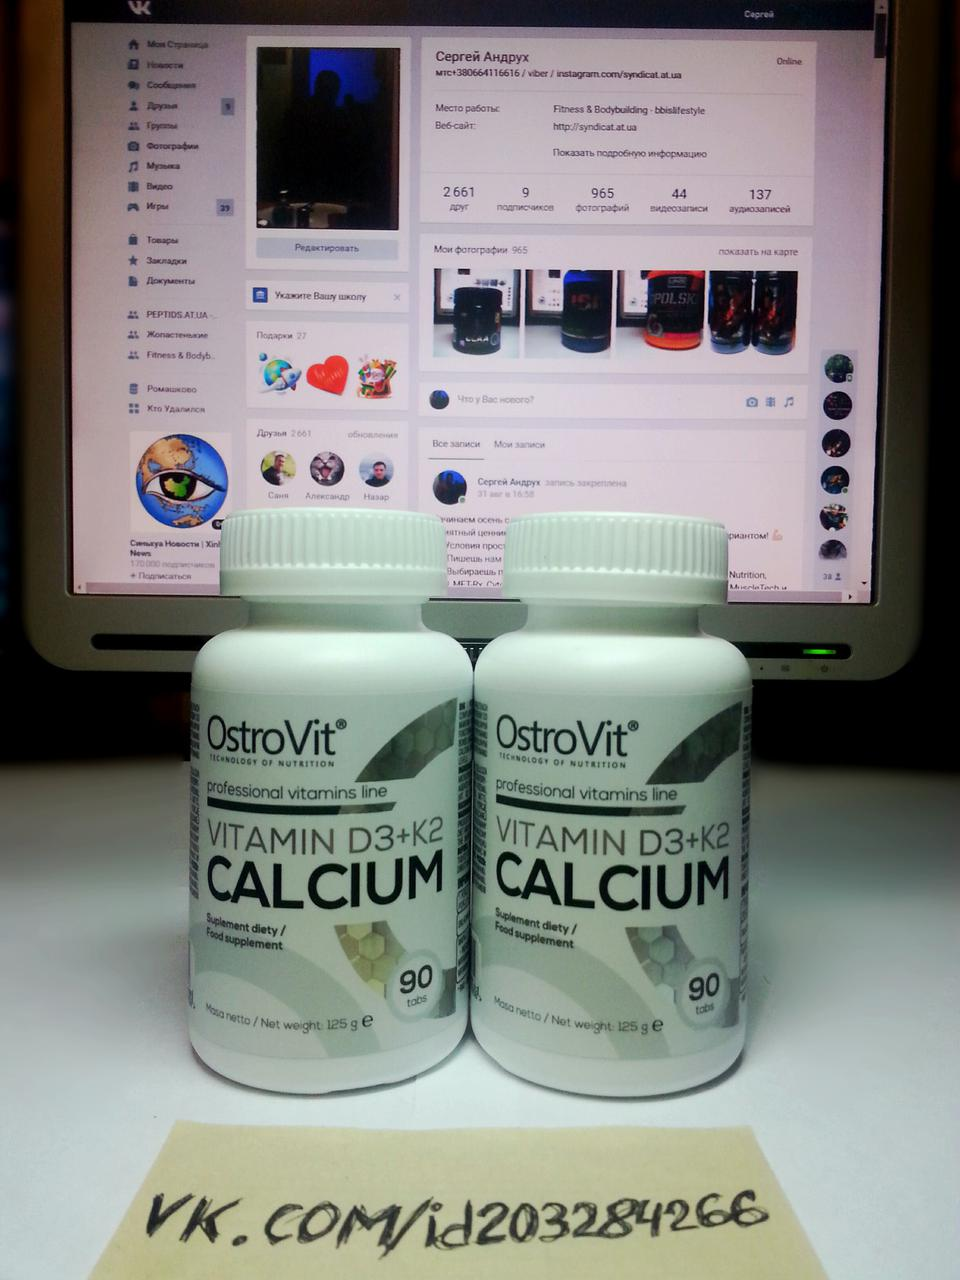 OstroVit Vitamin D3 K2 Calcium 90 табл